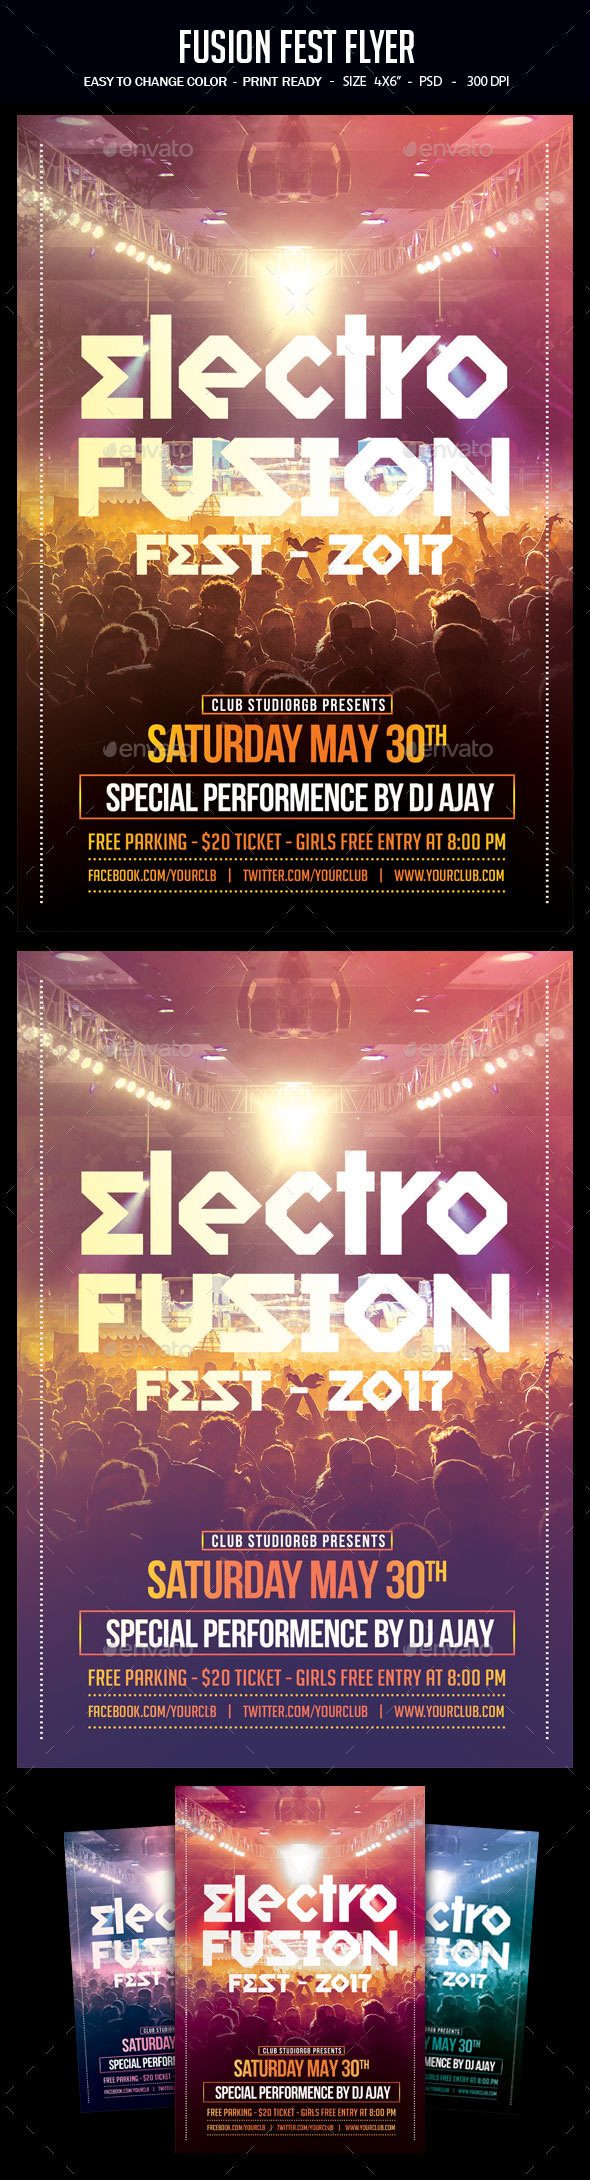 Fusion Fest Flyer - Clubs & Parties Events